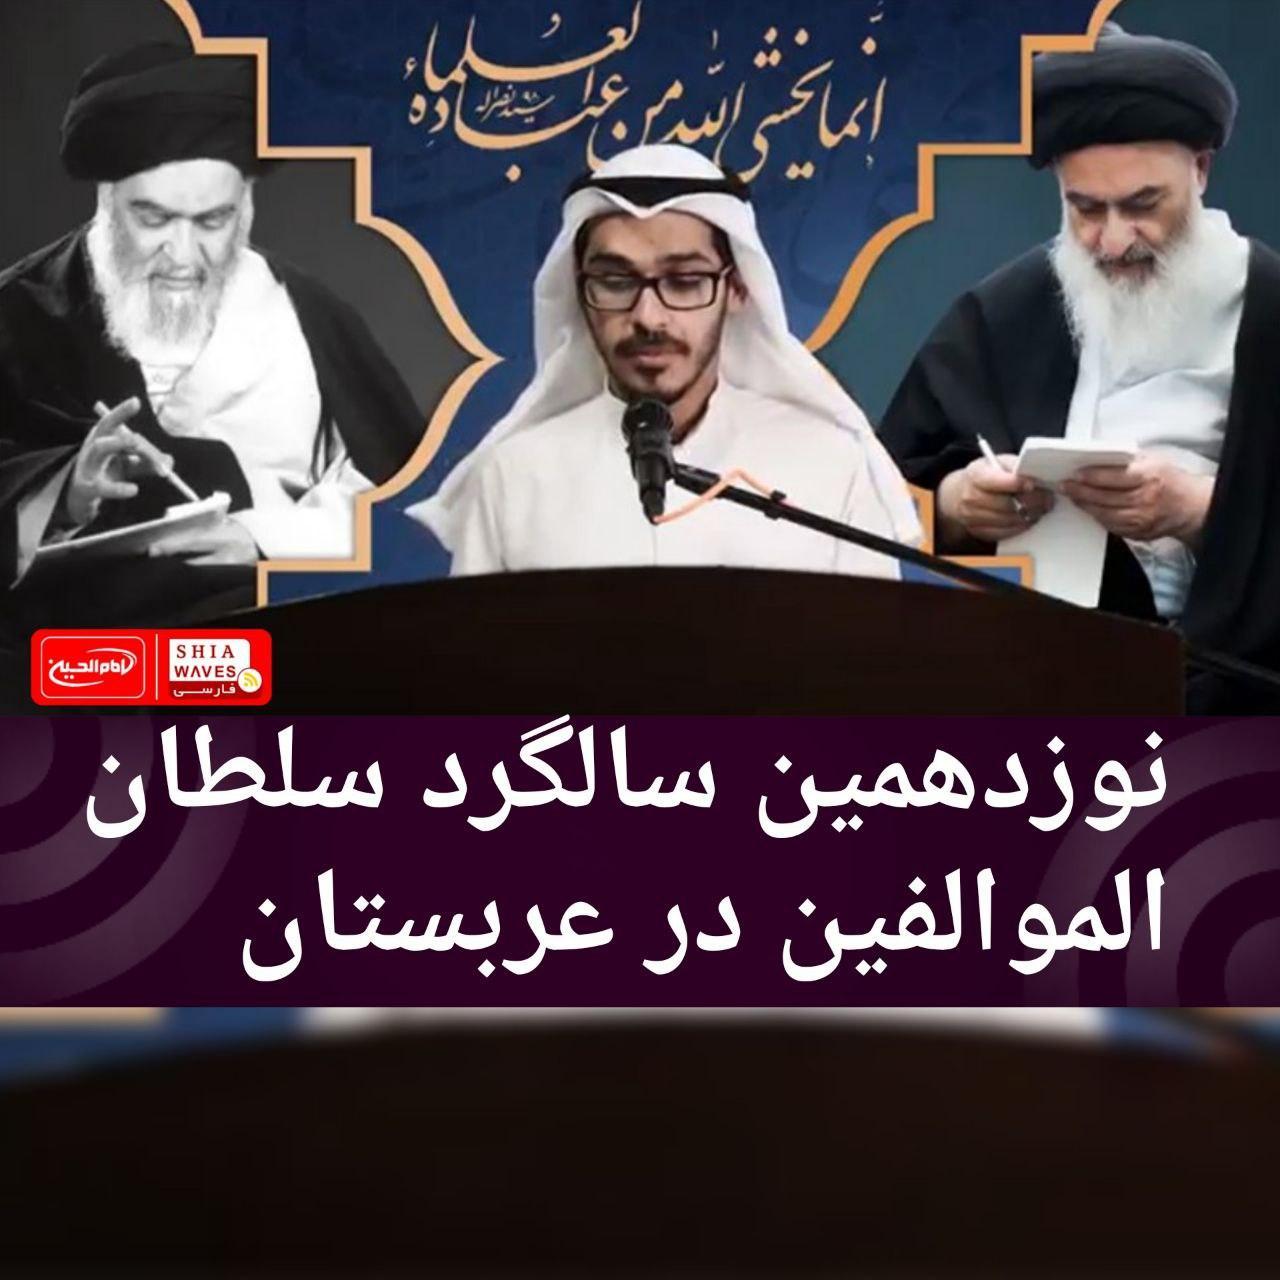 تصویر نوزدهمین سالگرد سلطان الموالفین در عربستان